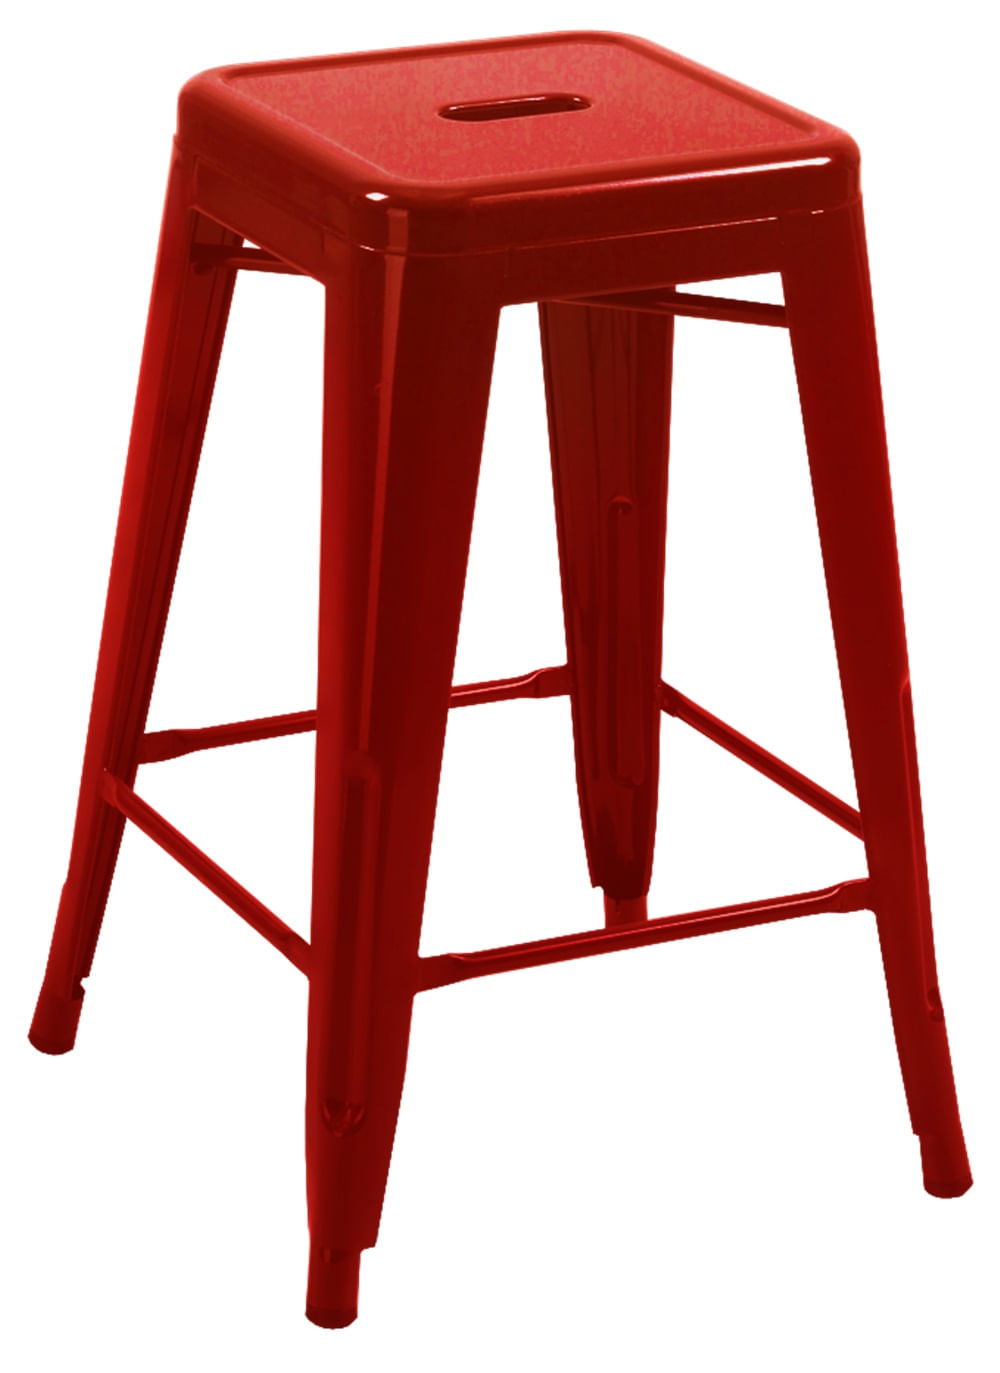 Banqueta Industrial Iron Vermelha Media 67 cm (ALT) - 24882